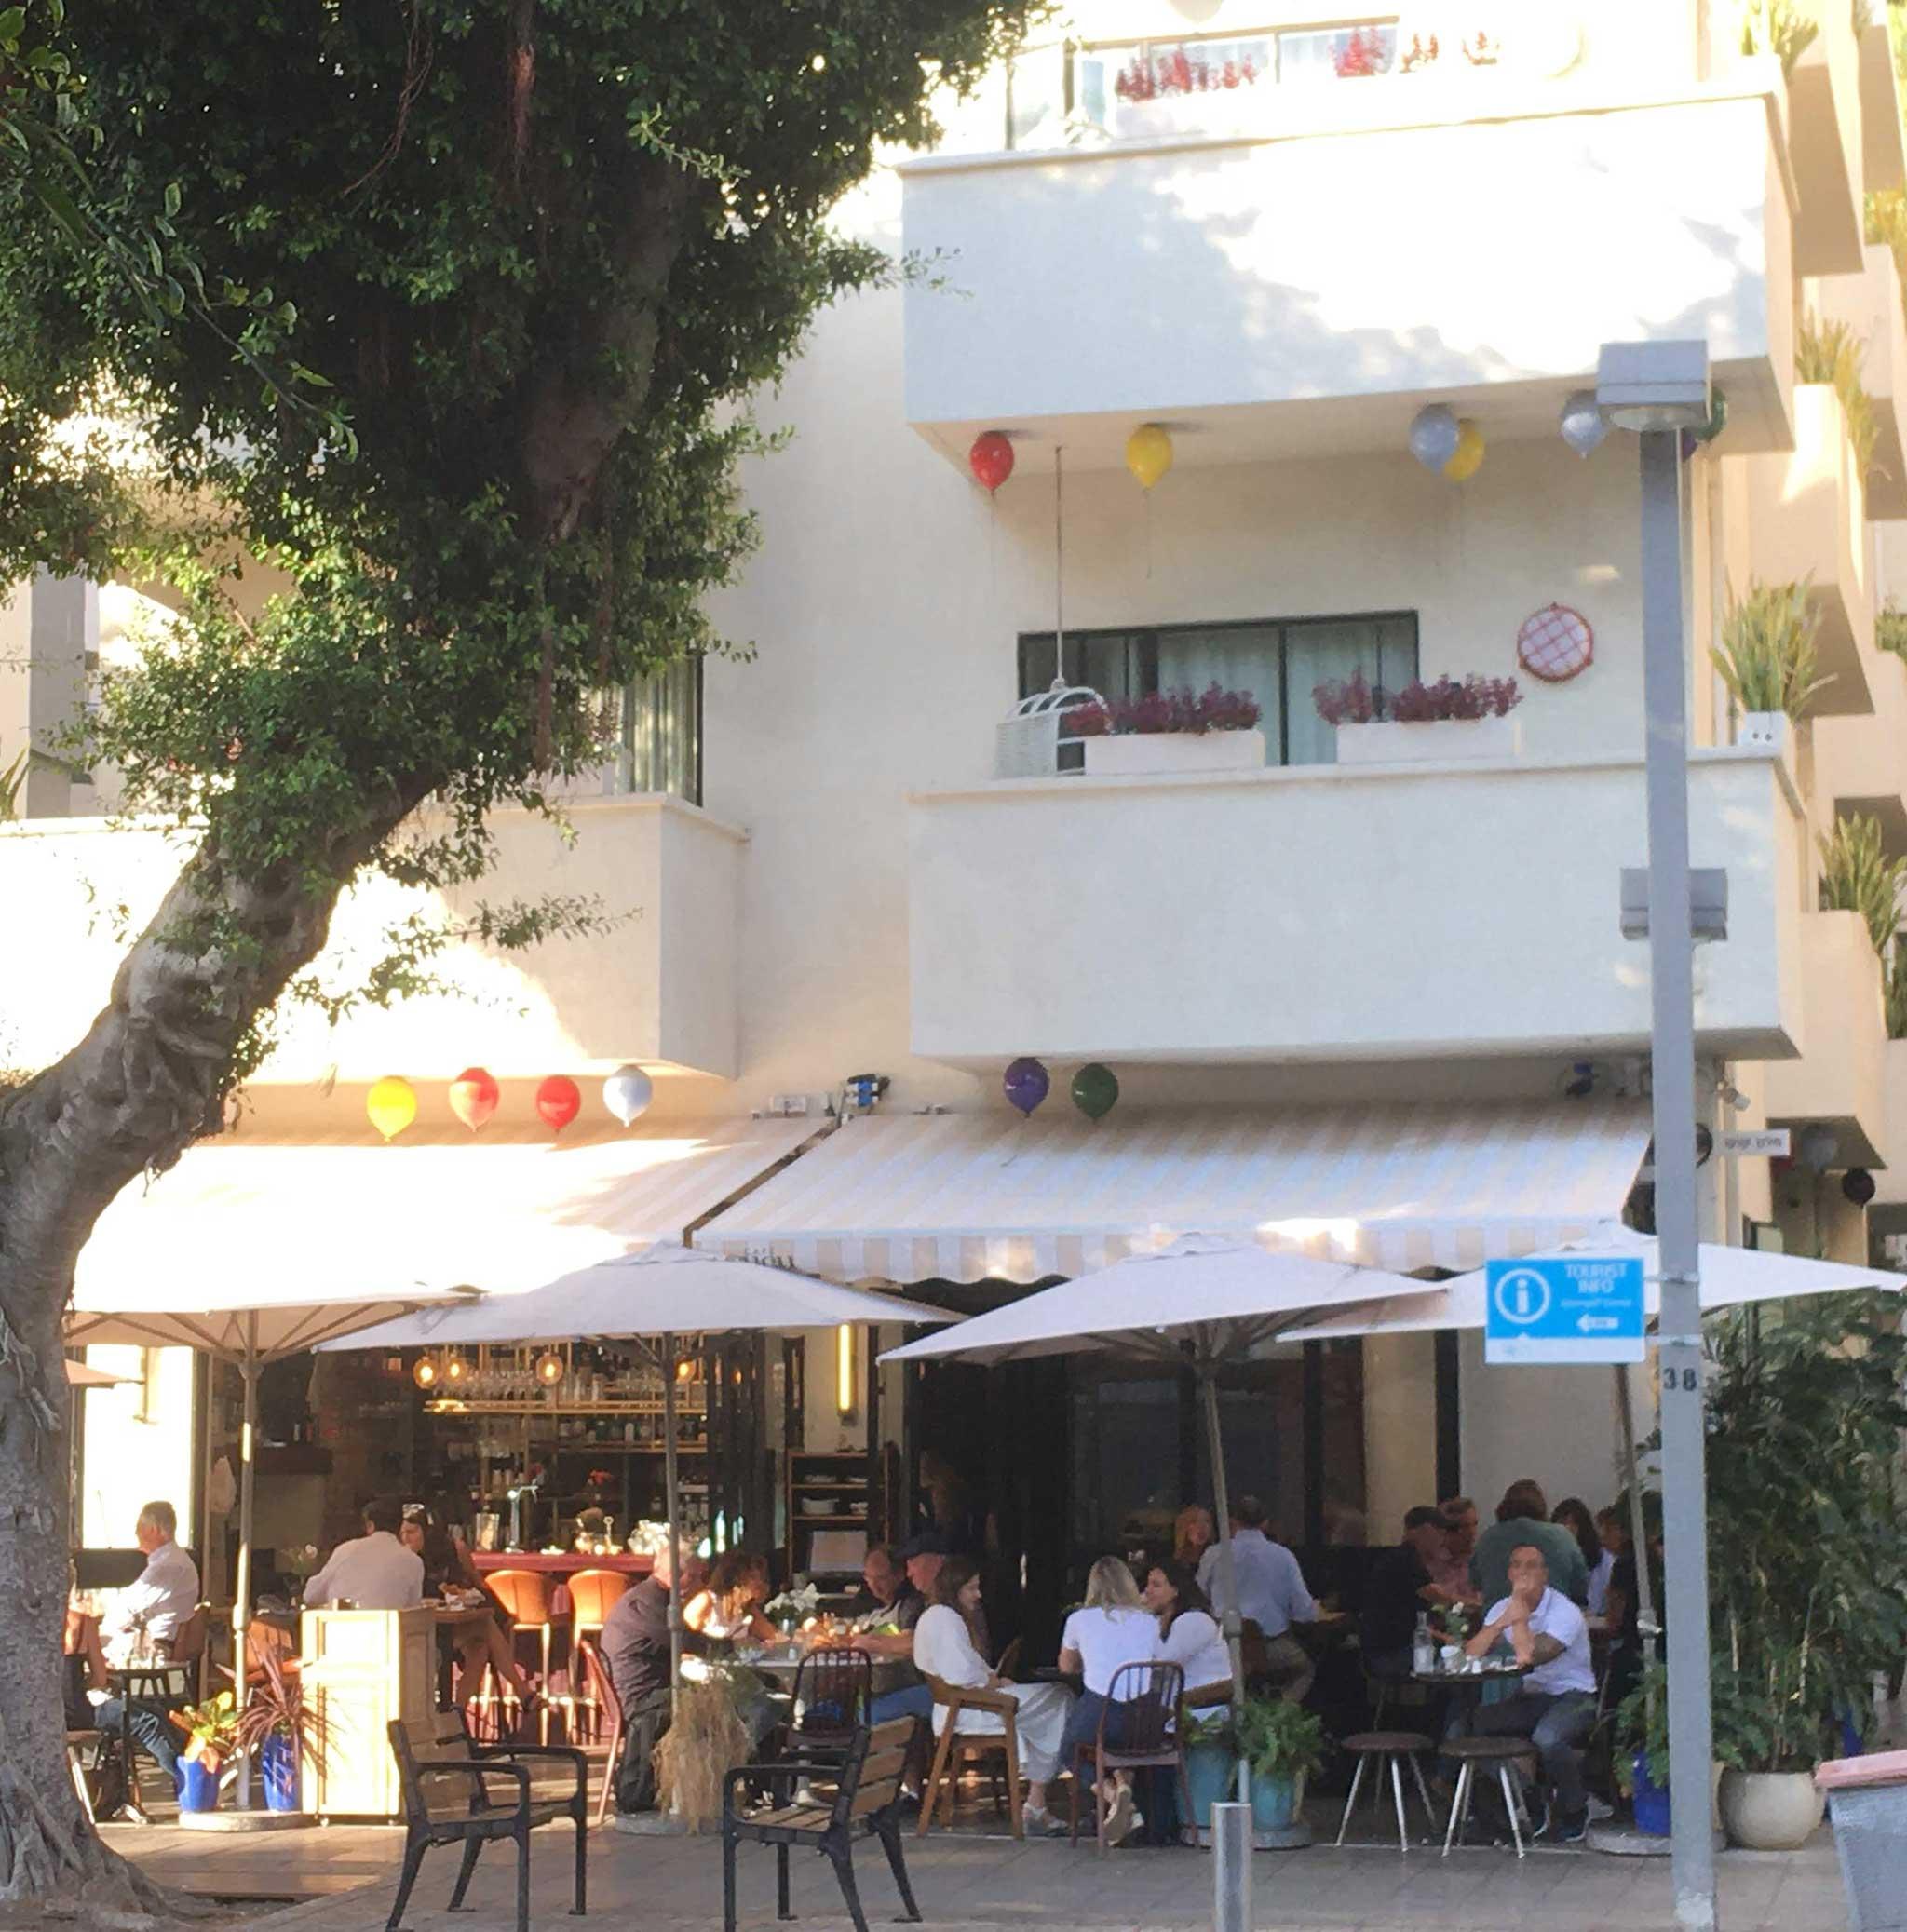 Dizengoff Street on Tel Aviv audio tour The White City